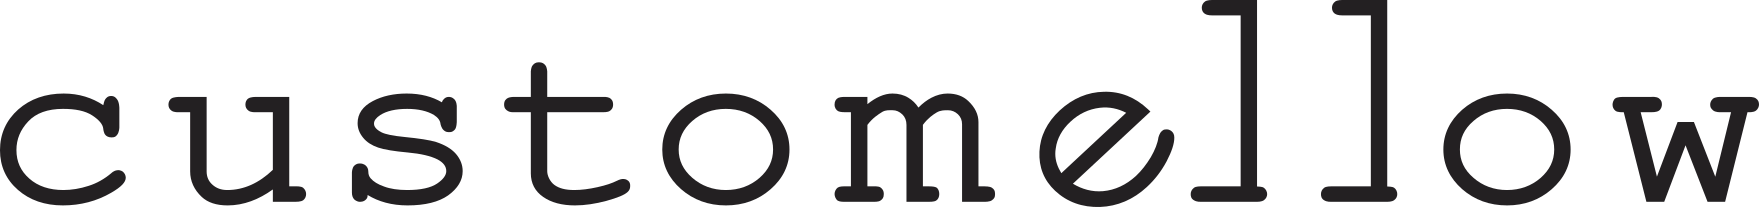 customellow_logo.png